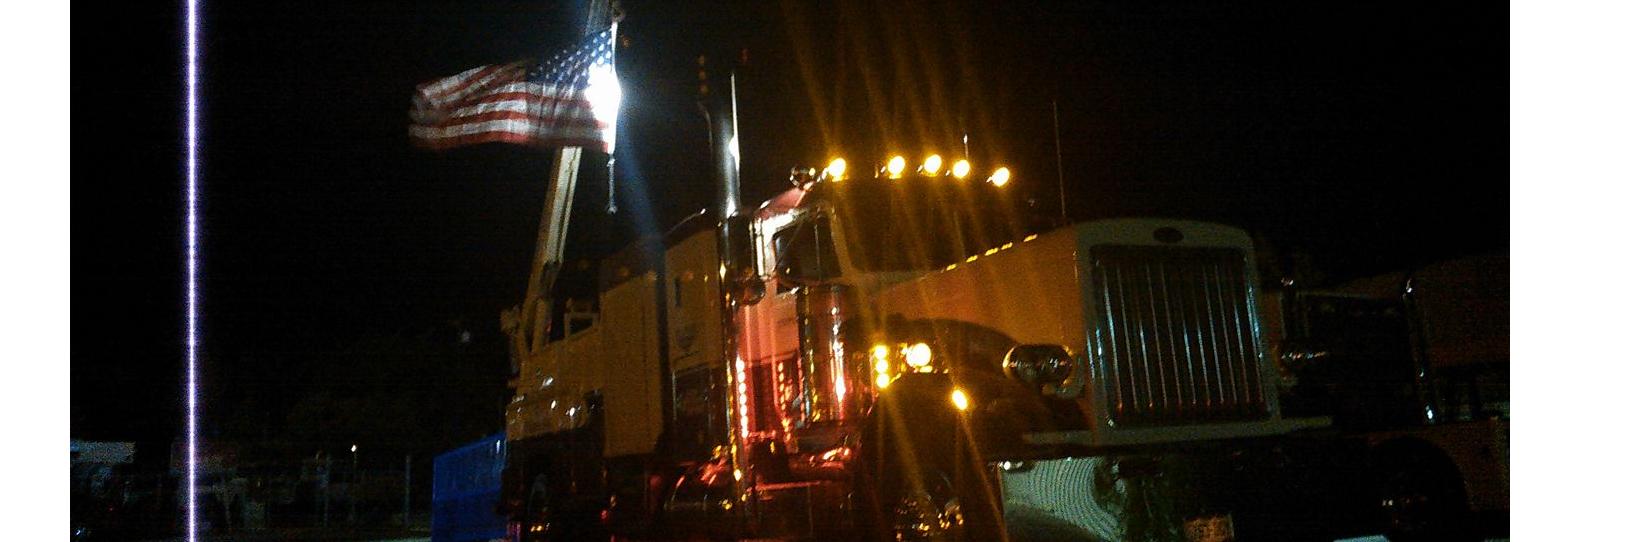 Kustom Diesel Towing Towing.com Profile Banner